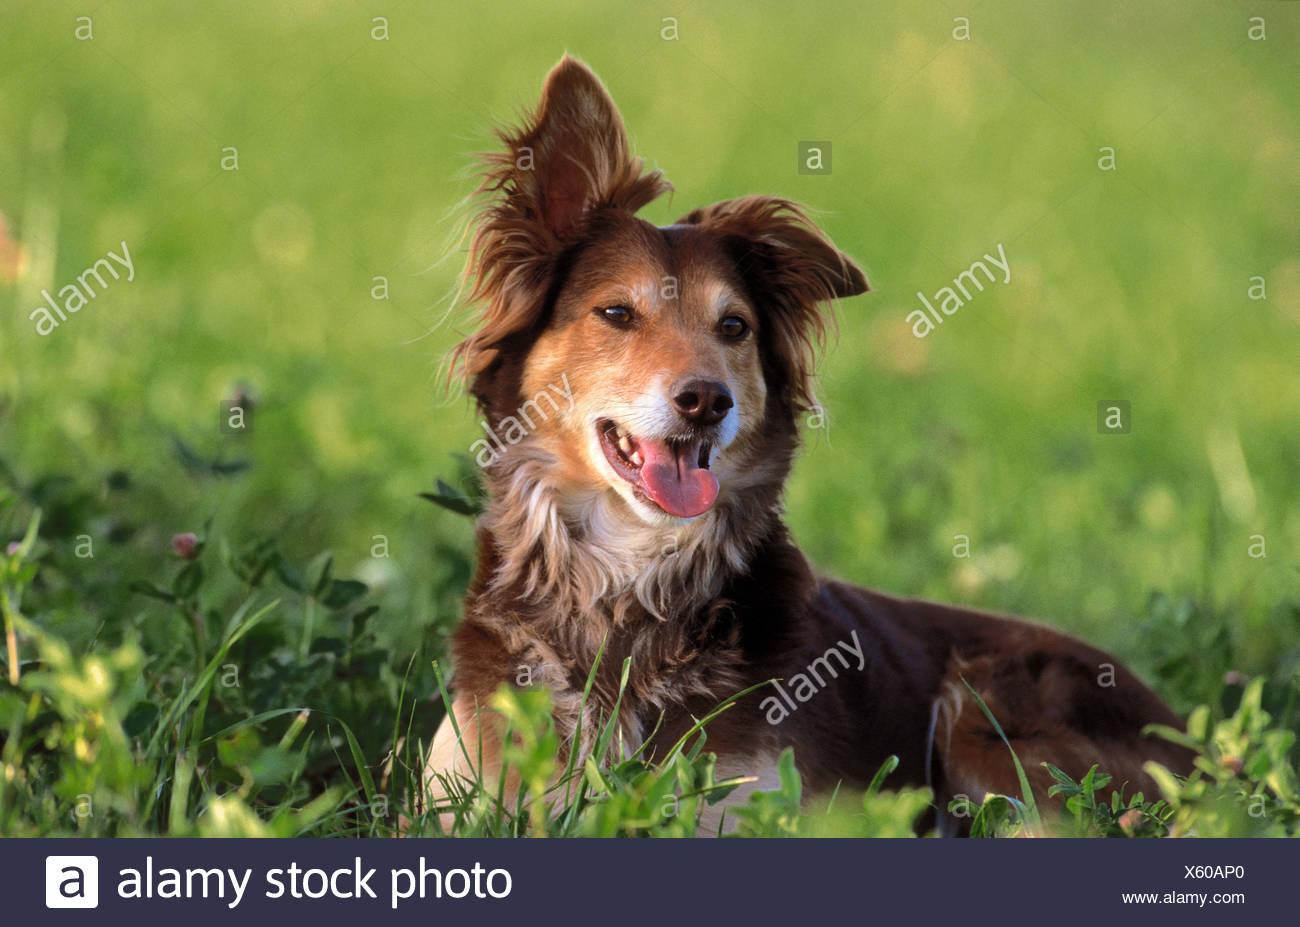 halbe Rasse Hund auf Wiese Stockbild